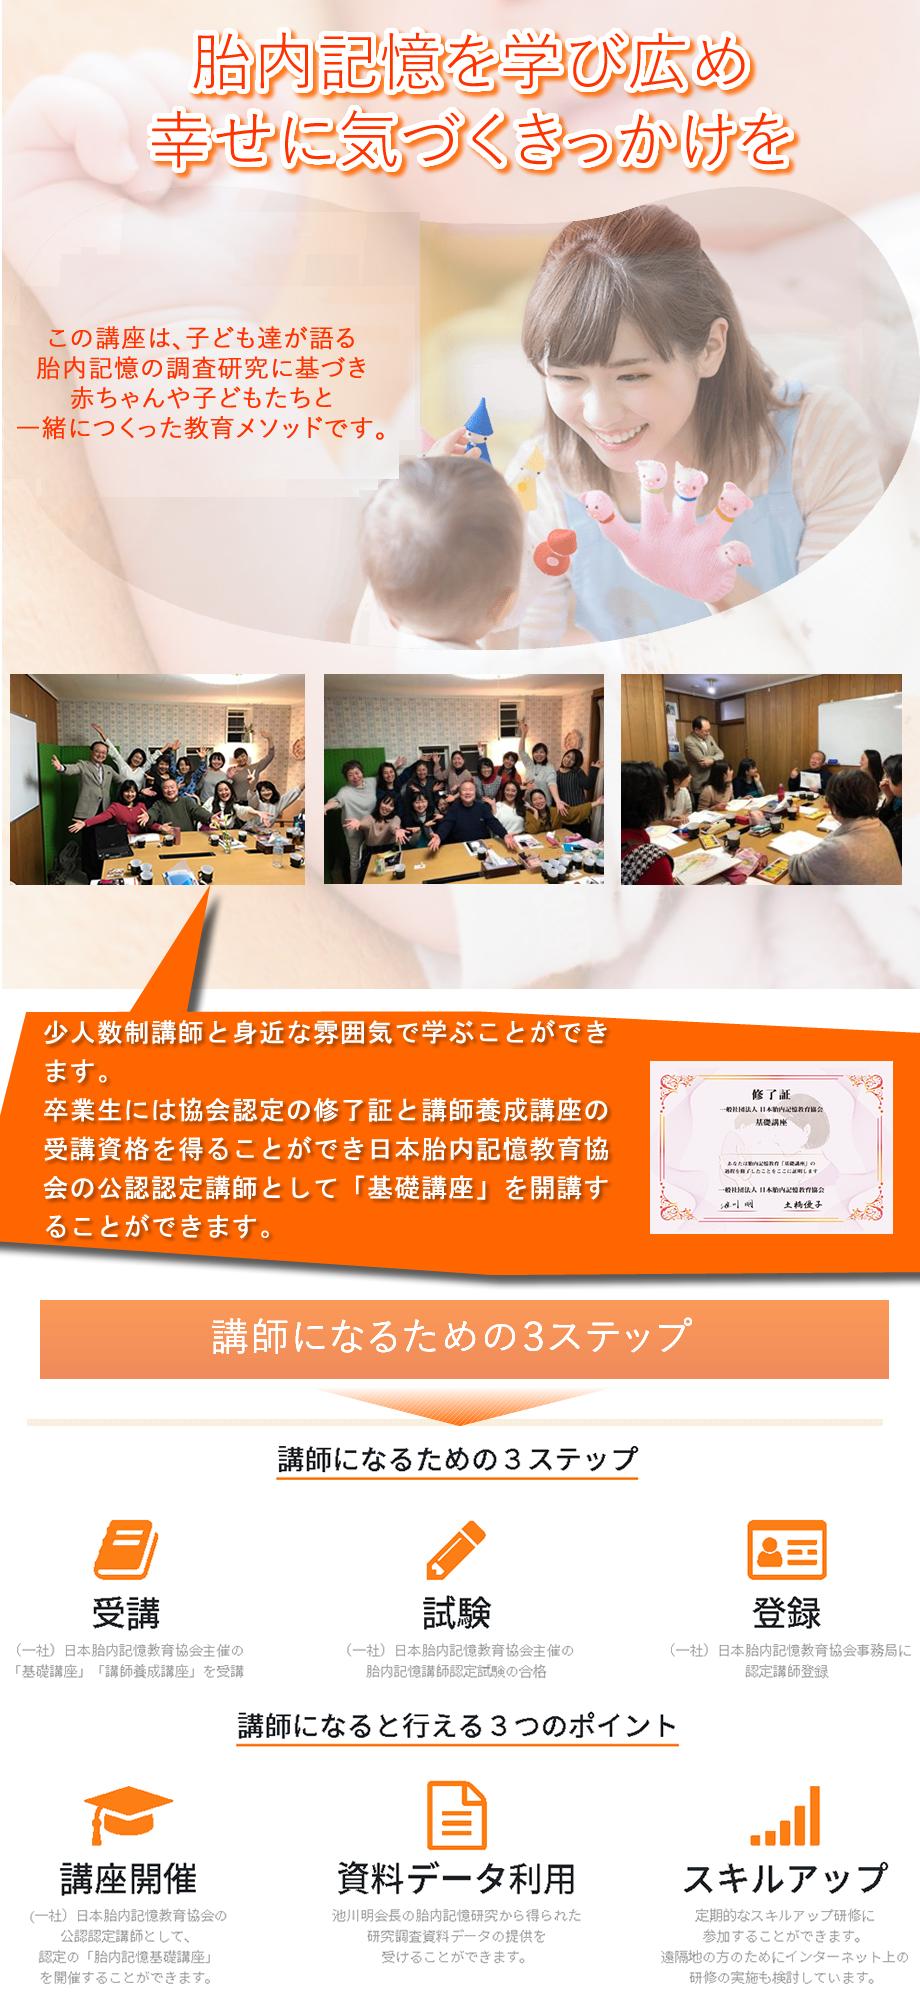 tainaikiokulp1 - 日本胎内記憶教育教会基礎講座、現在4期生を募集中です。